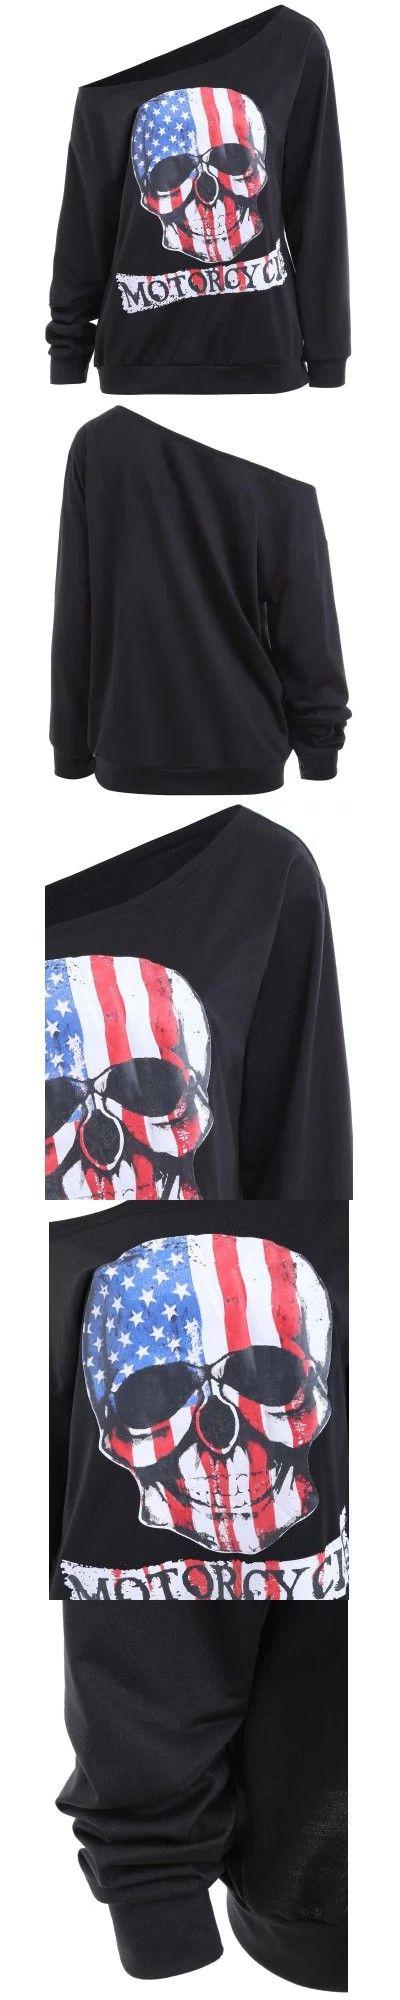 best 25 black american flag ideas on pinterest american flag